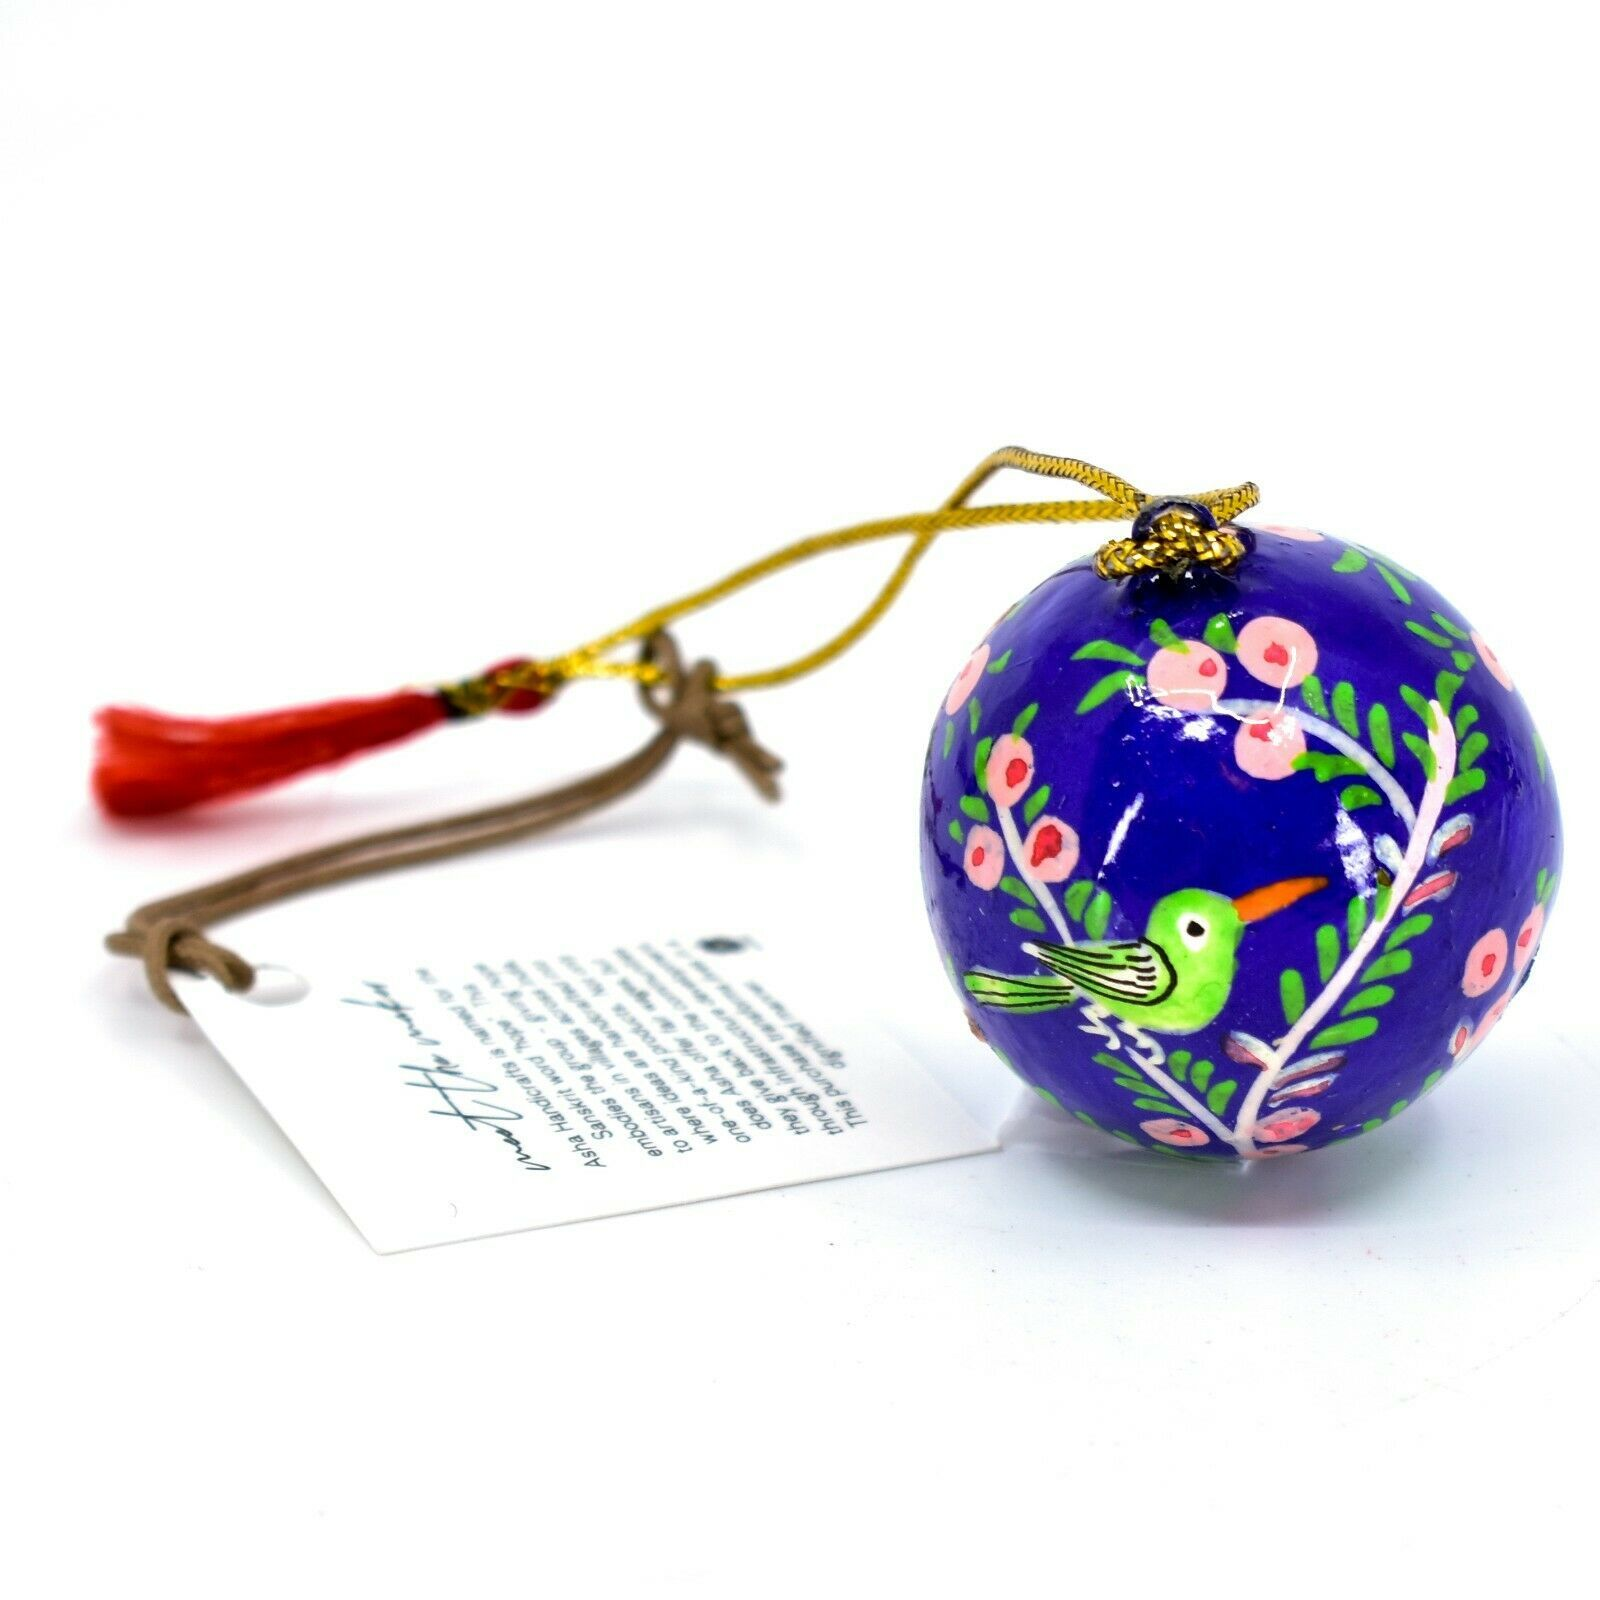 Asha Handicrafts Hand Painted Papier-Mâché Blue Bird Holiday Christmas Ornament